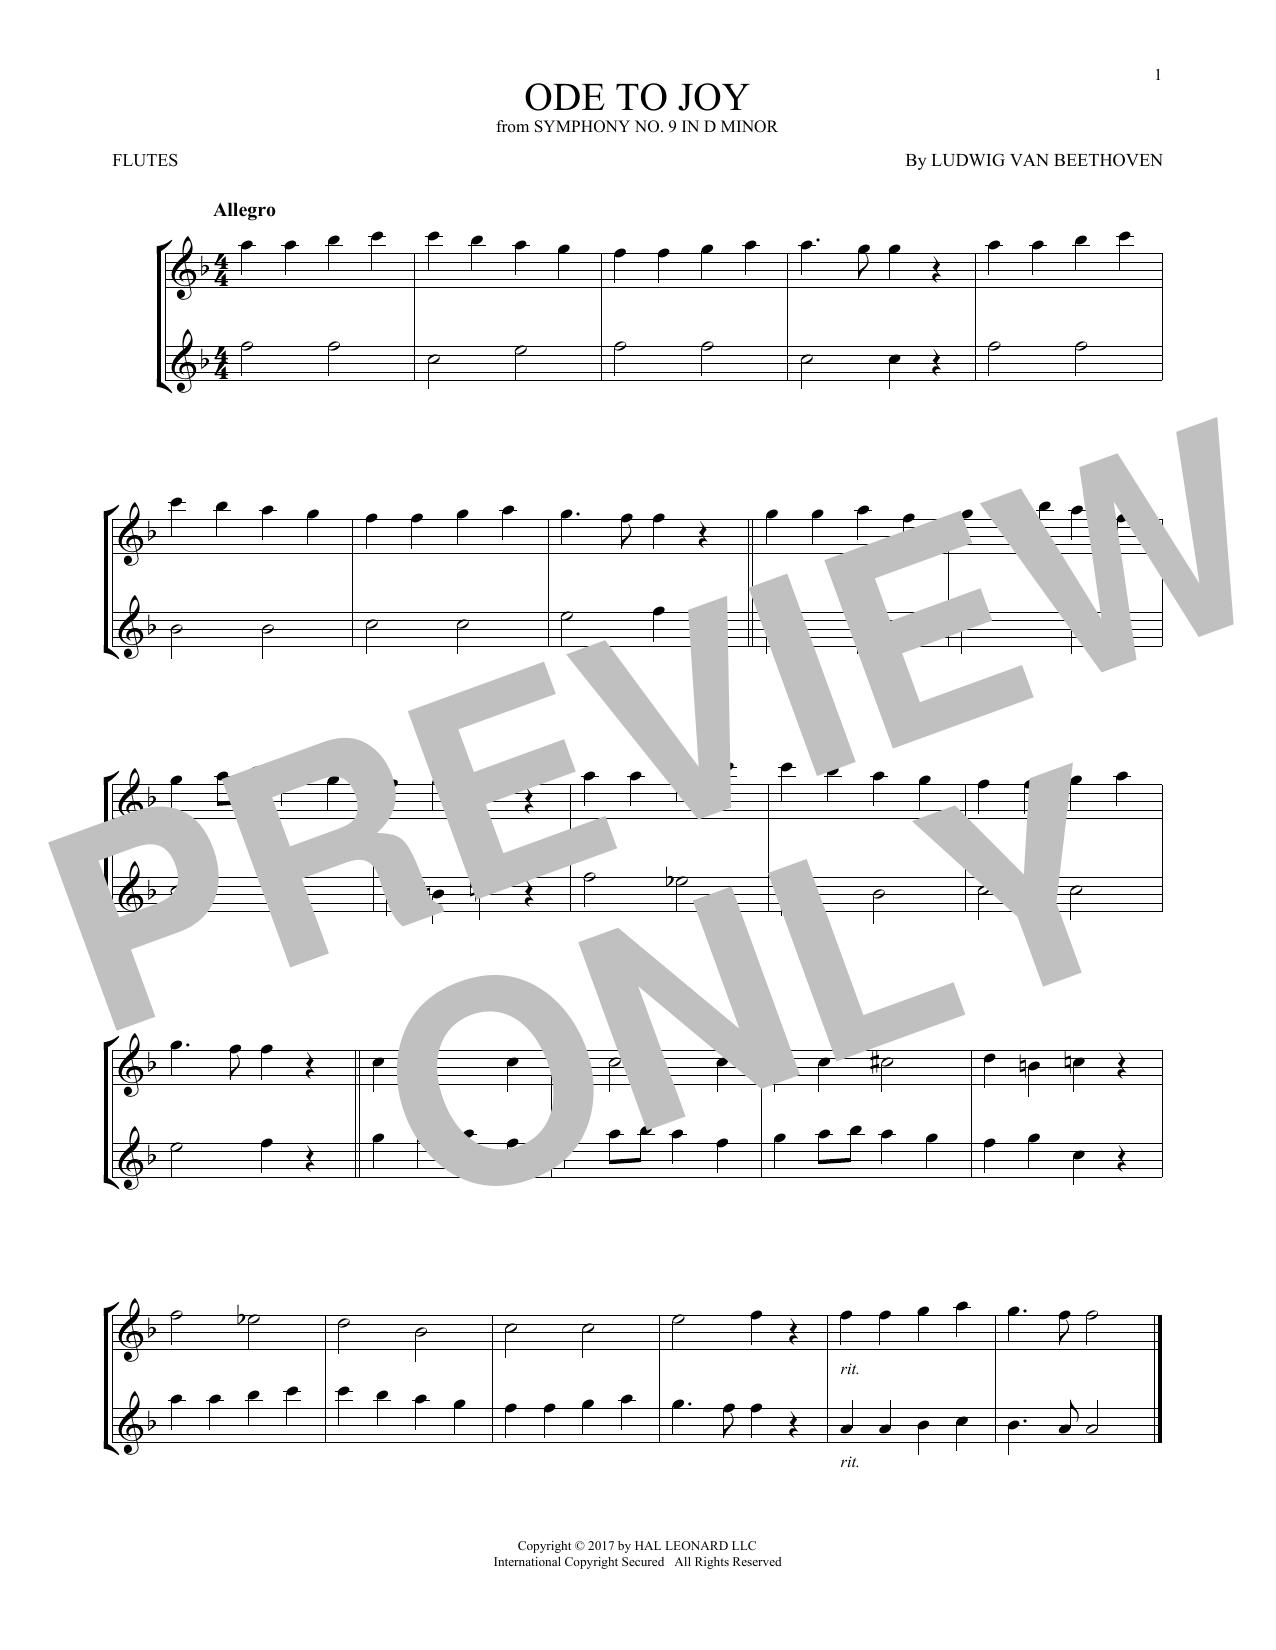 Ludwig van Beethoven 'Ode To Joy' Sheet Music Notes, Chords | Download  Printable Flute Duet - SKU: 253195